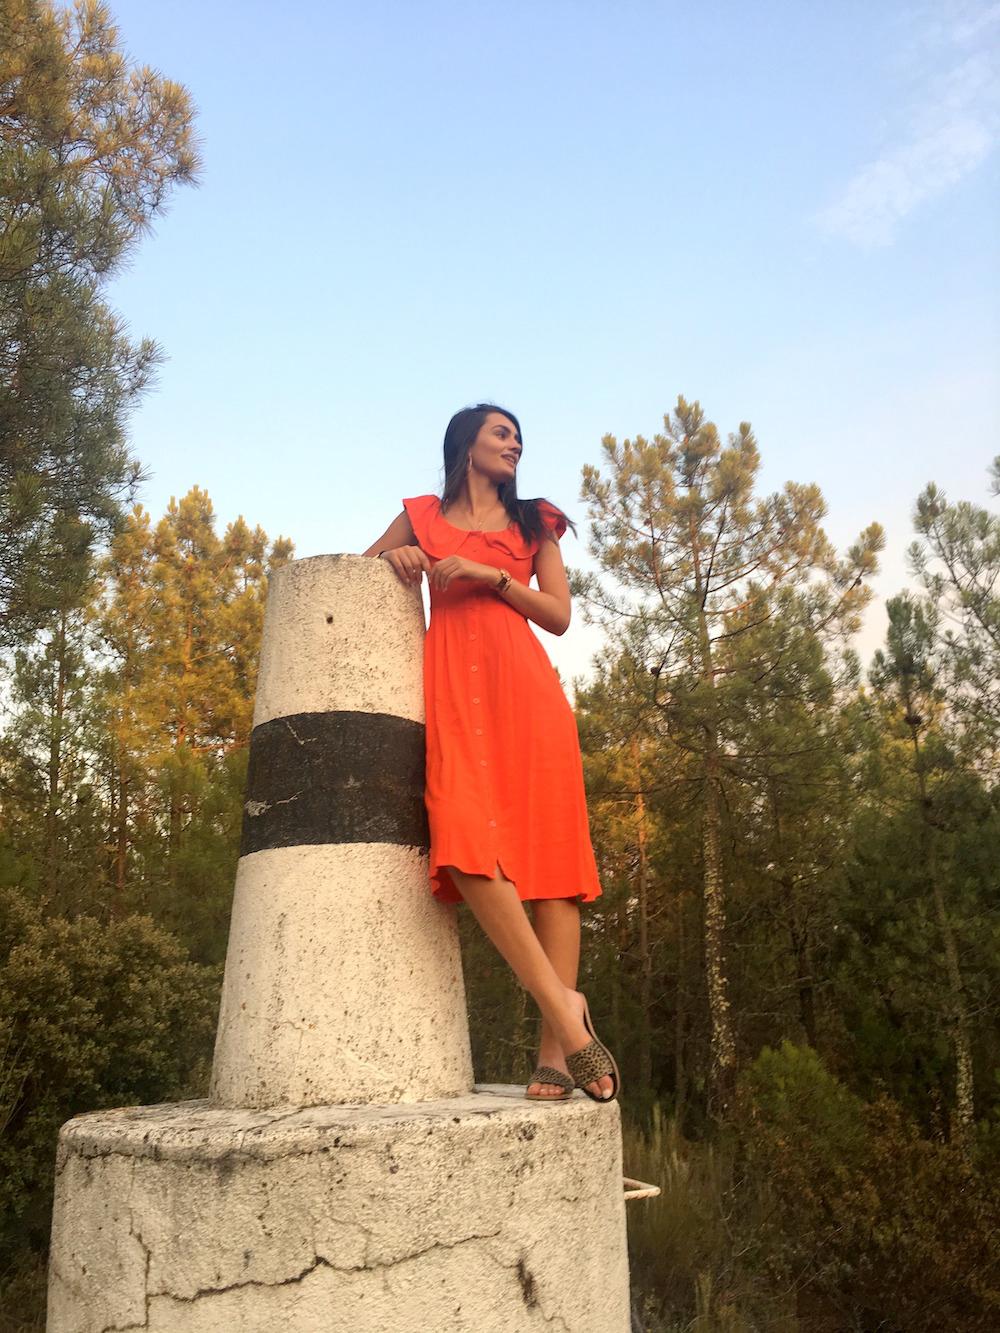 countryside peexo travel blogger